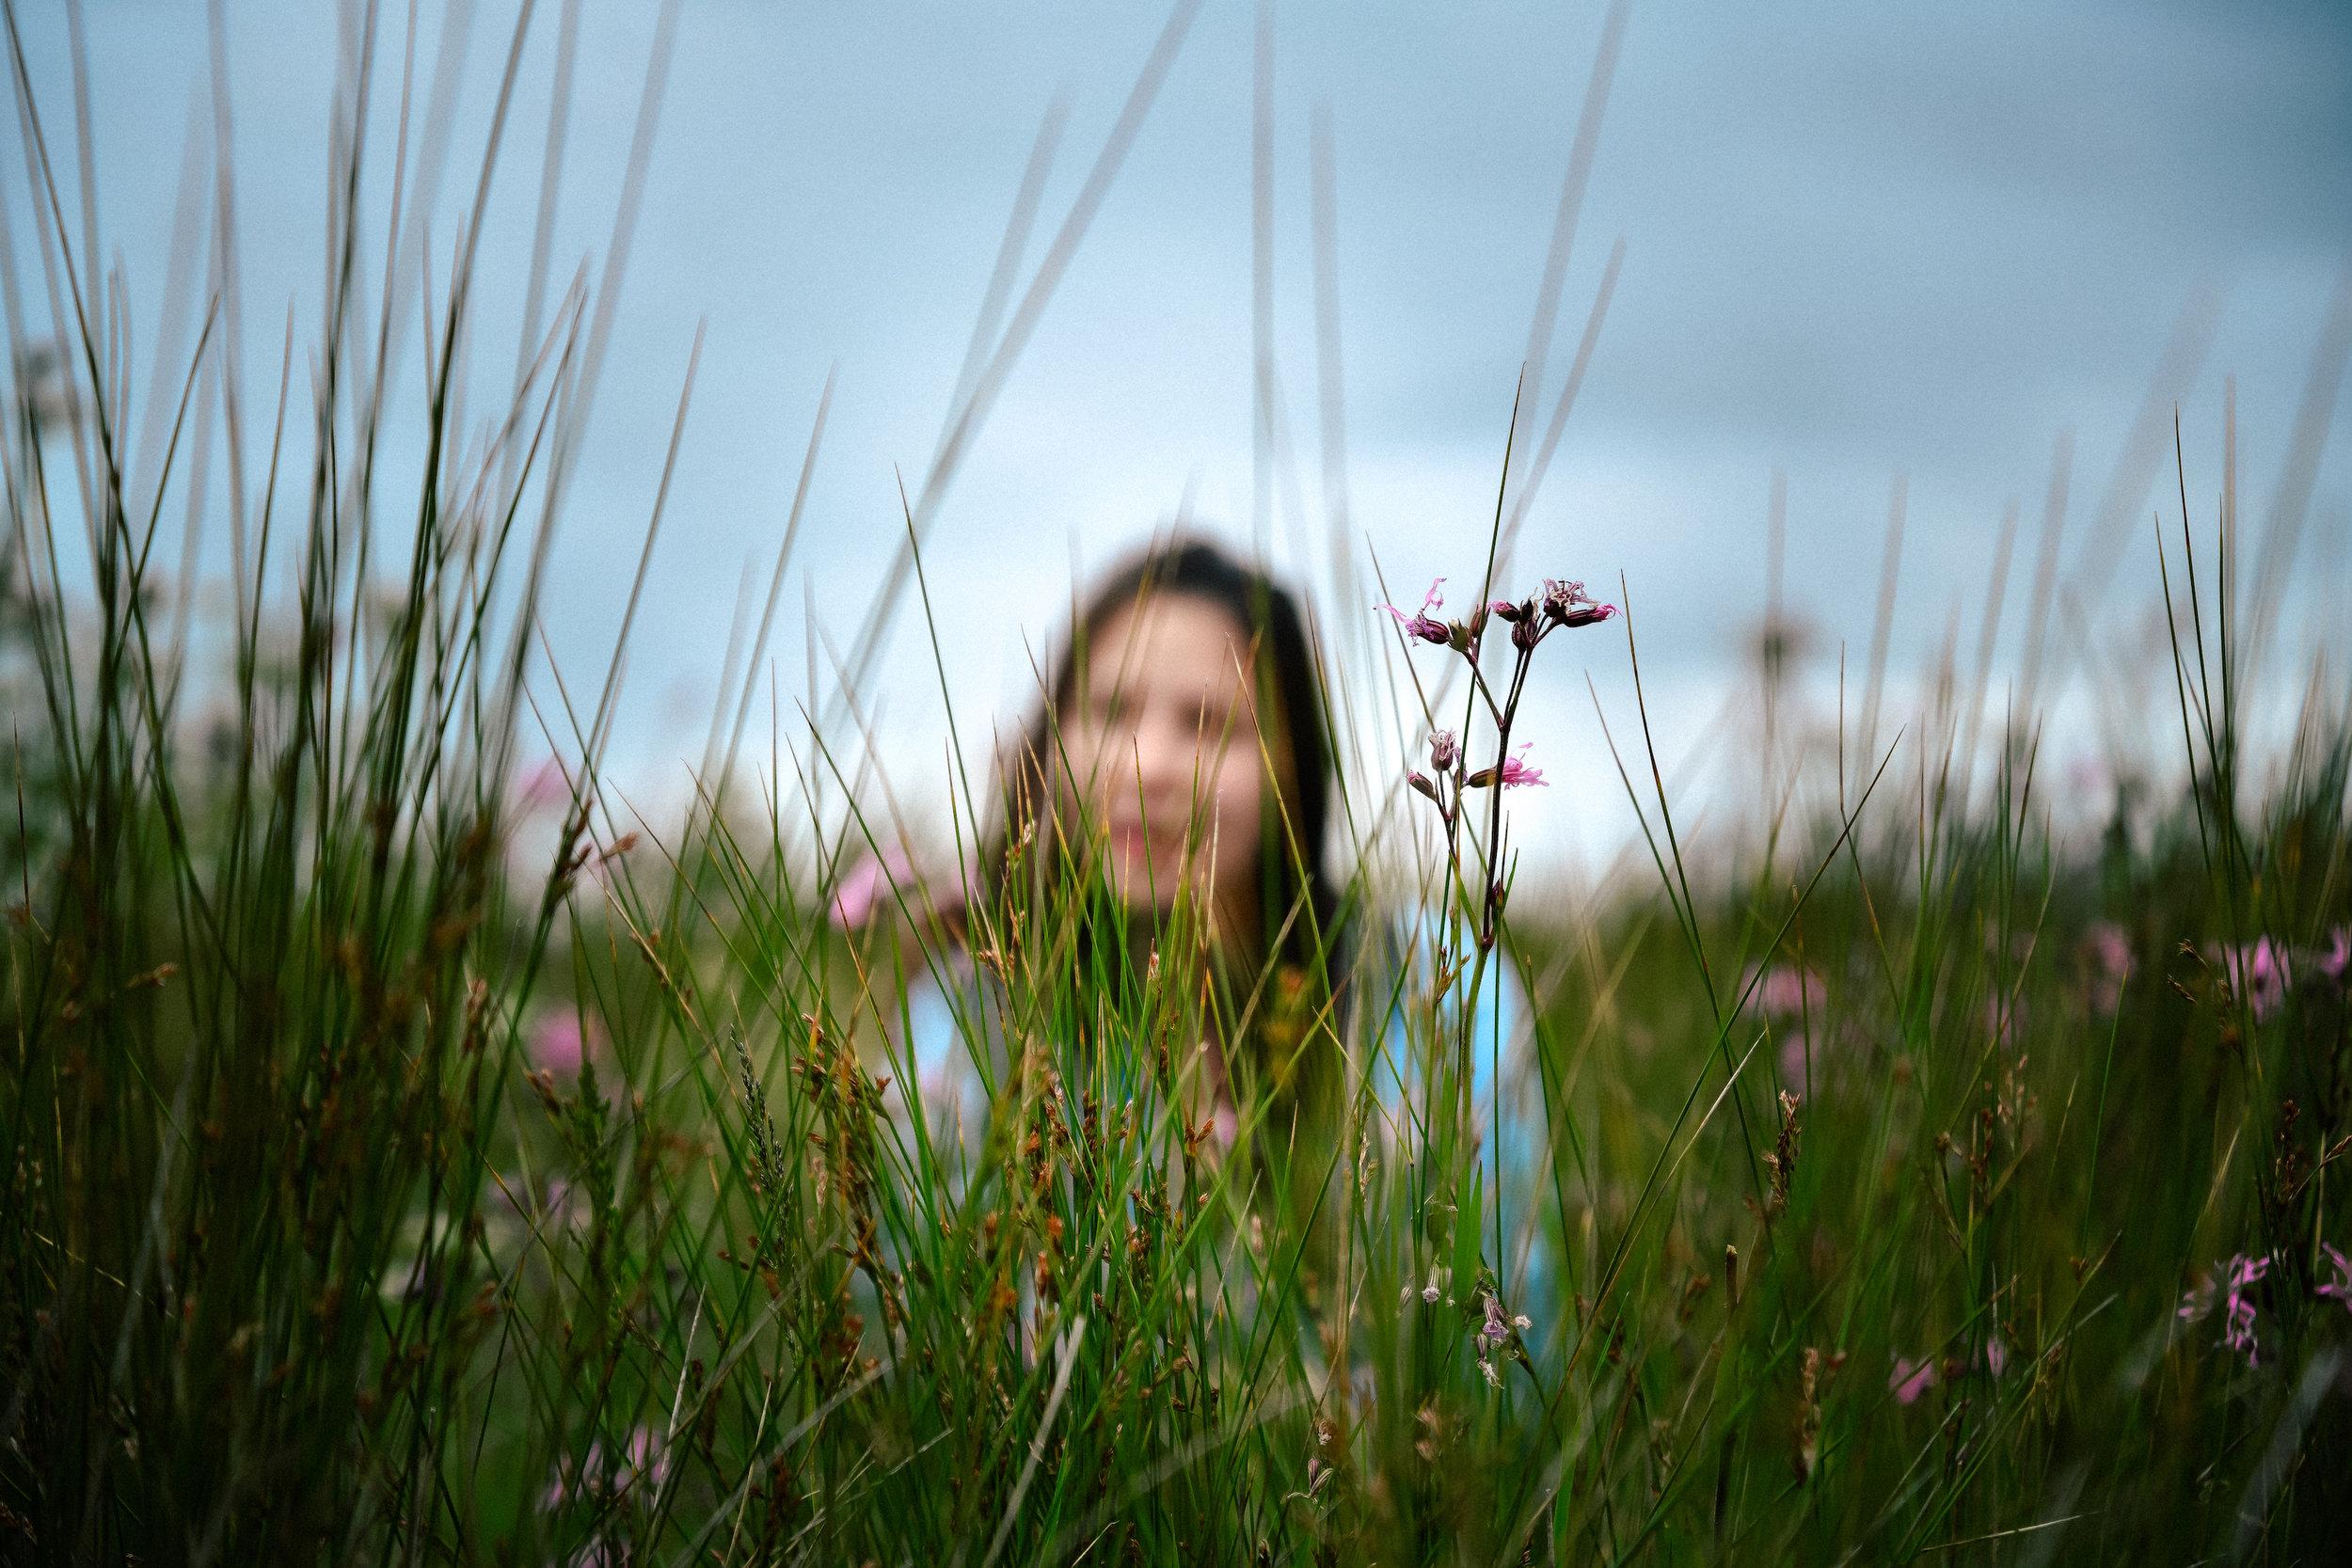 blurry portrait of me